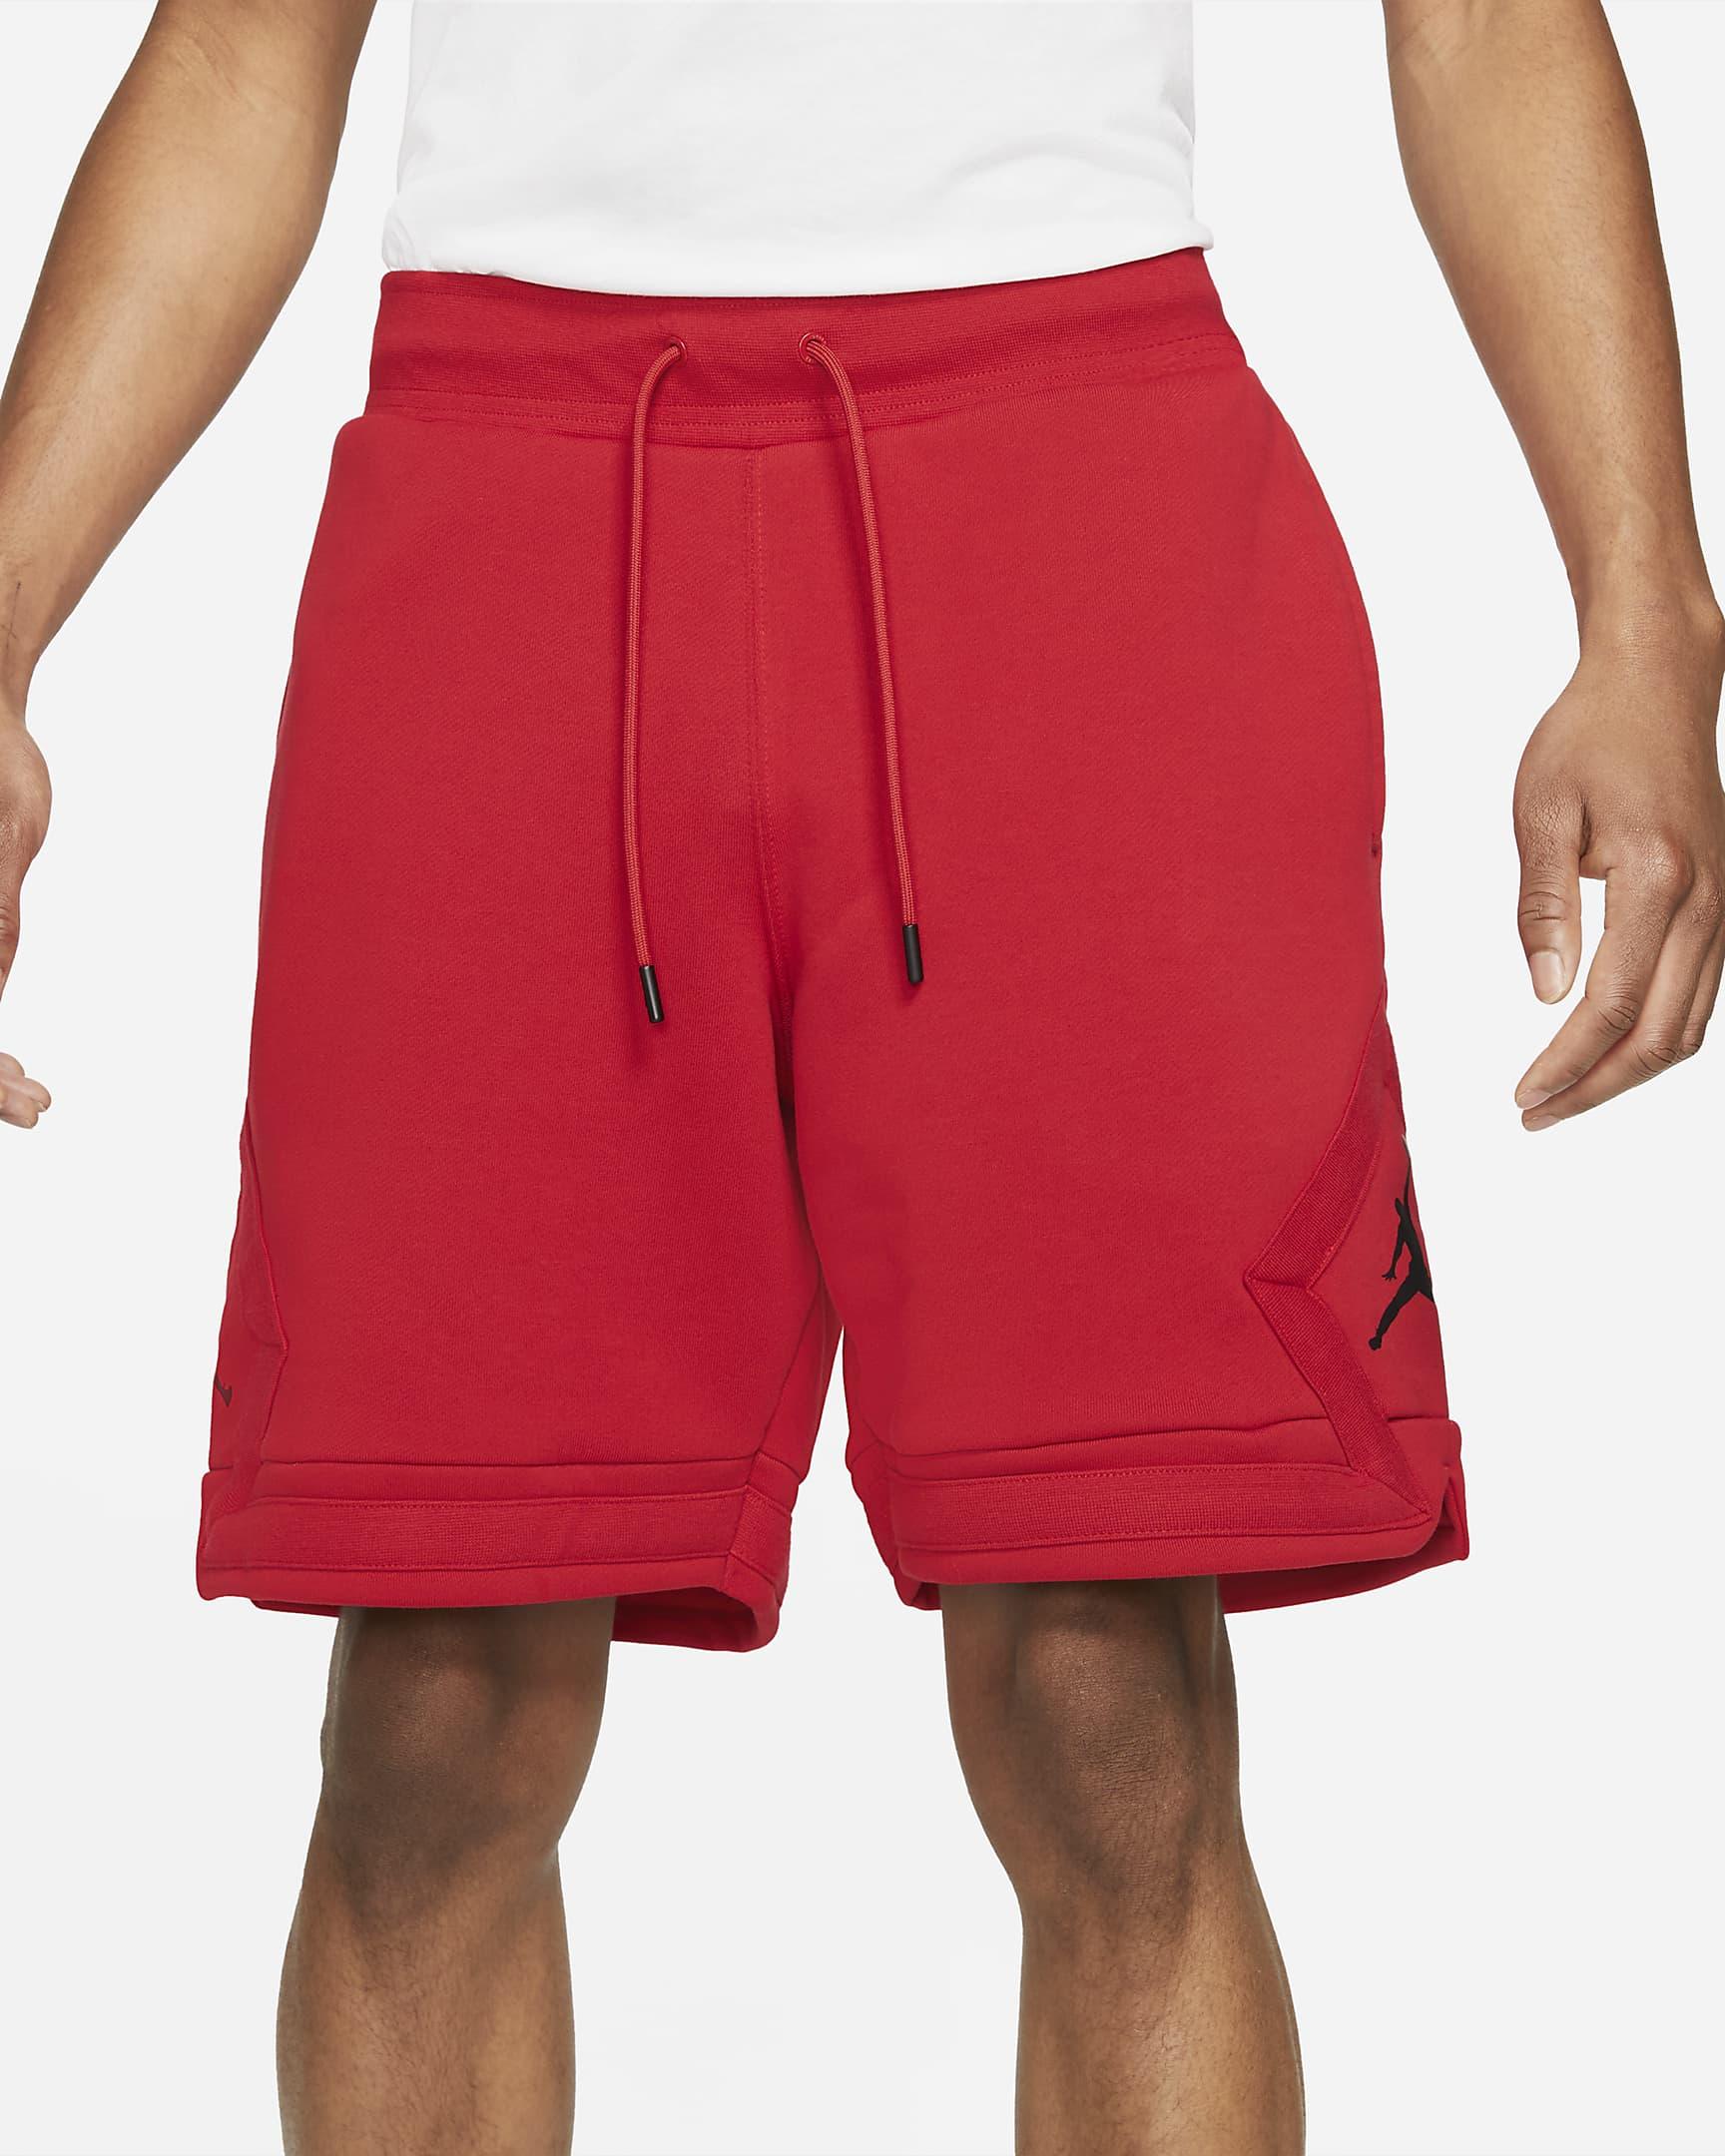 jordan-essential-mens-fleece-diamond-shorts-hcJWW8-2.png